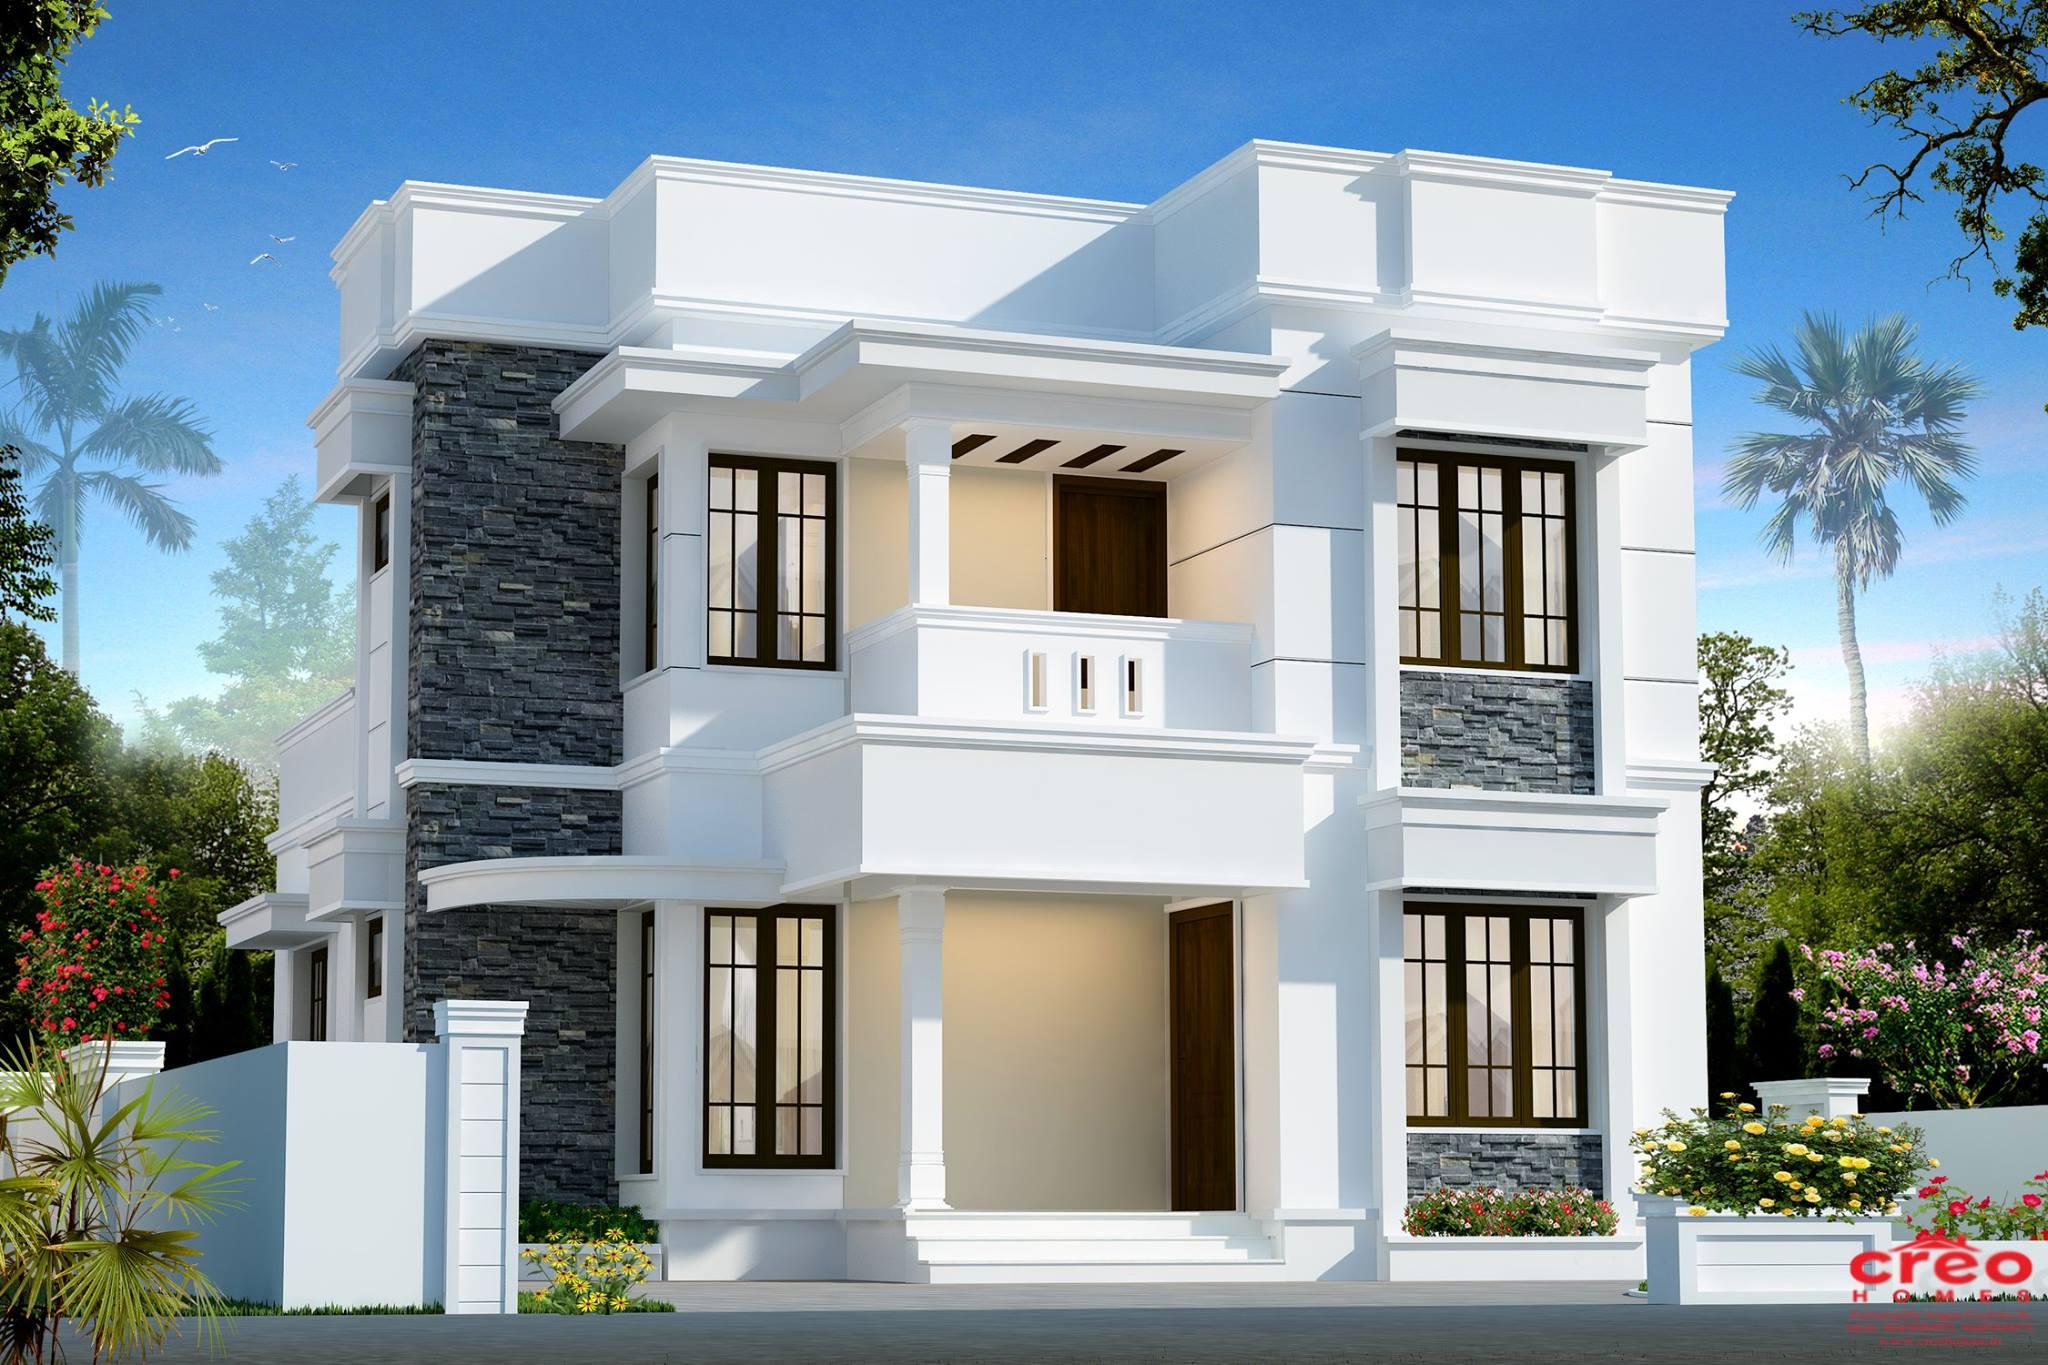 Photo of A Fabulous contemporary Home Design